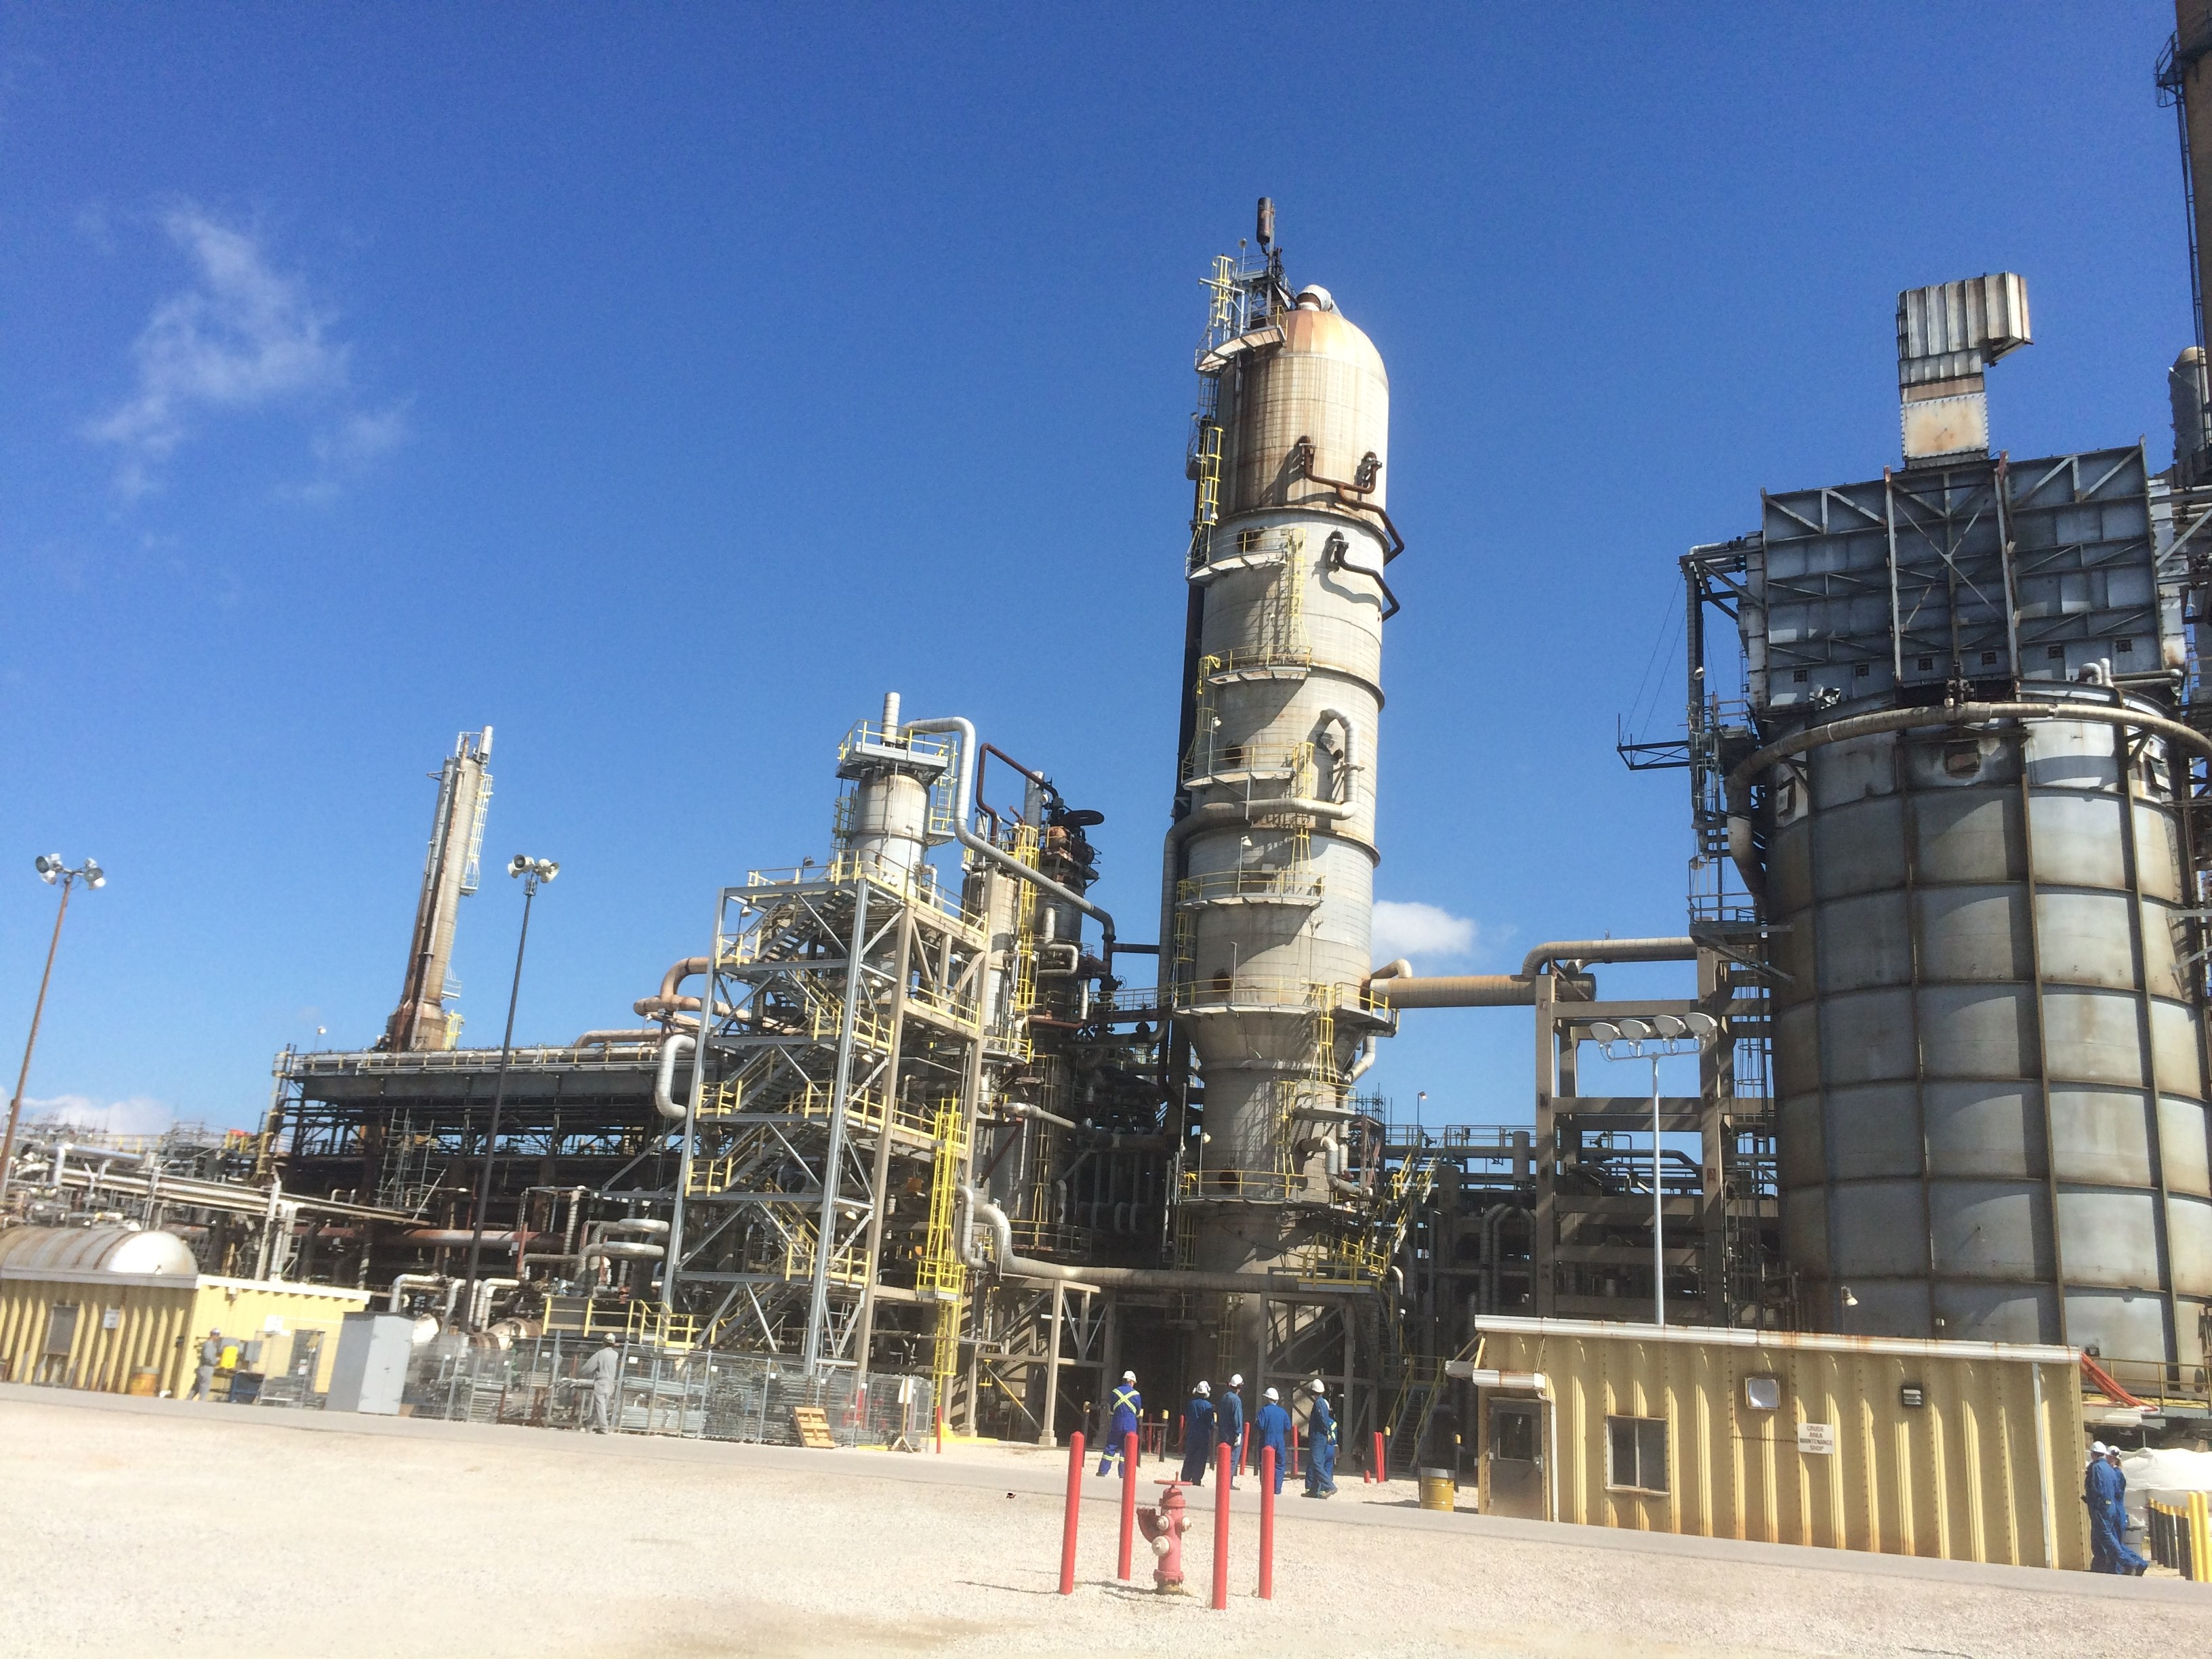 Used Crude Distillation Unit For Sale At Phoenix Equipment